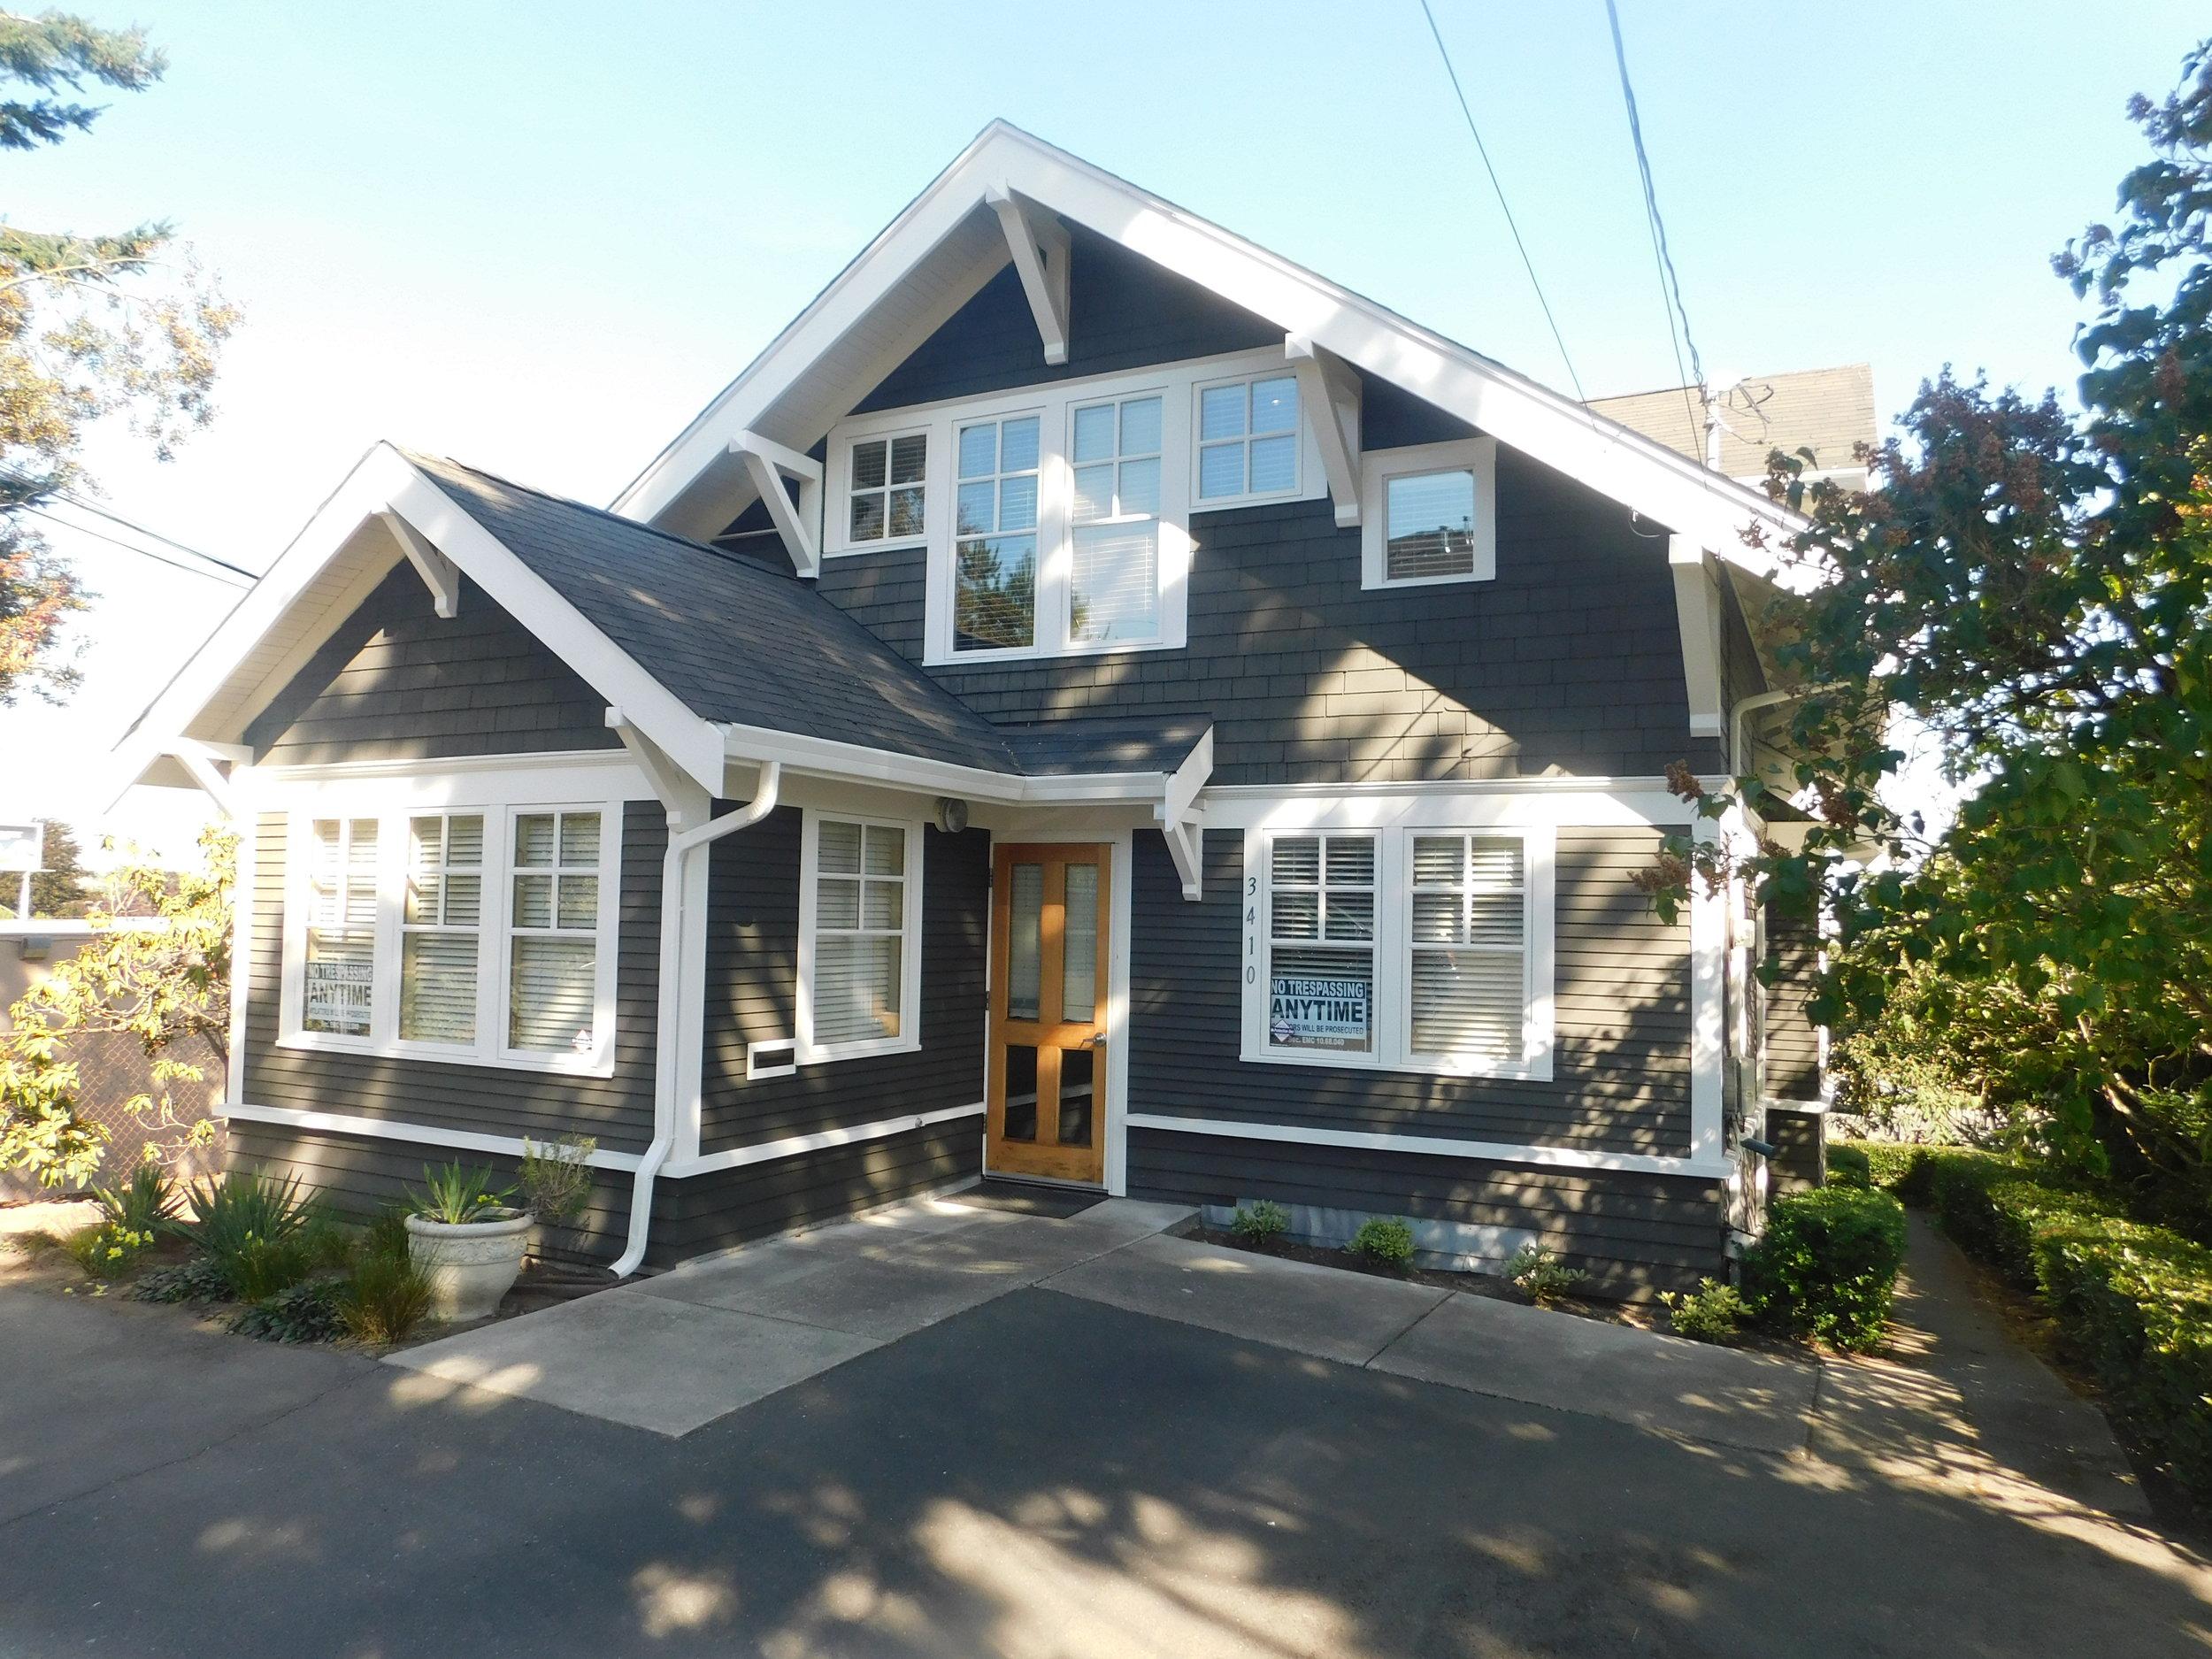 Office For Sale/Lease - 3410 Broadway, Everett WA 98201